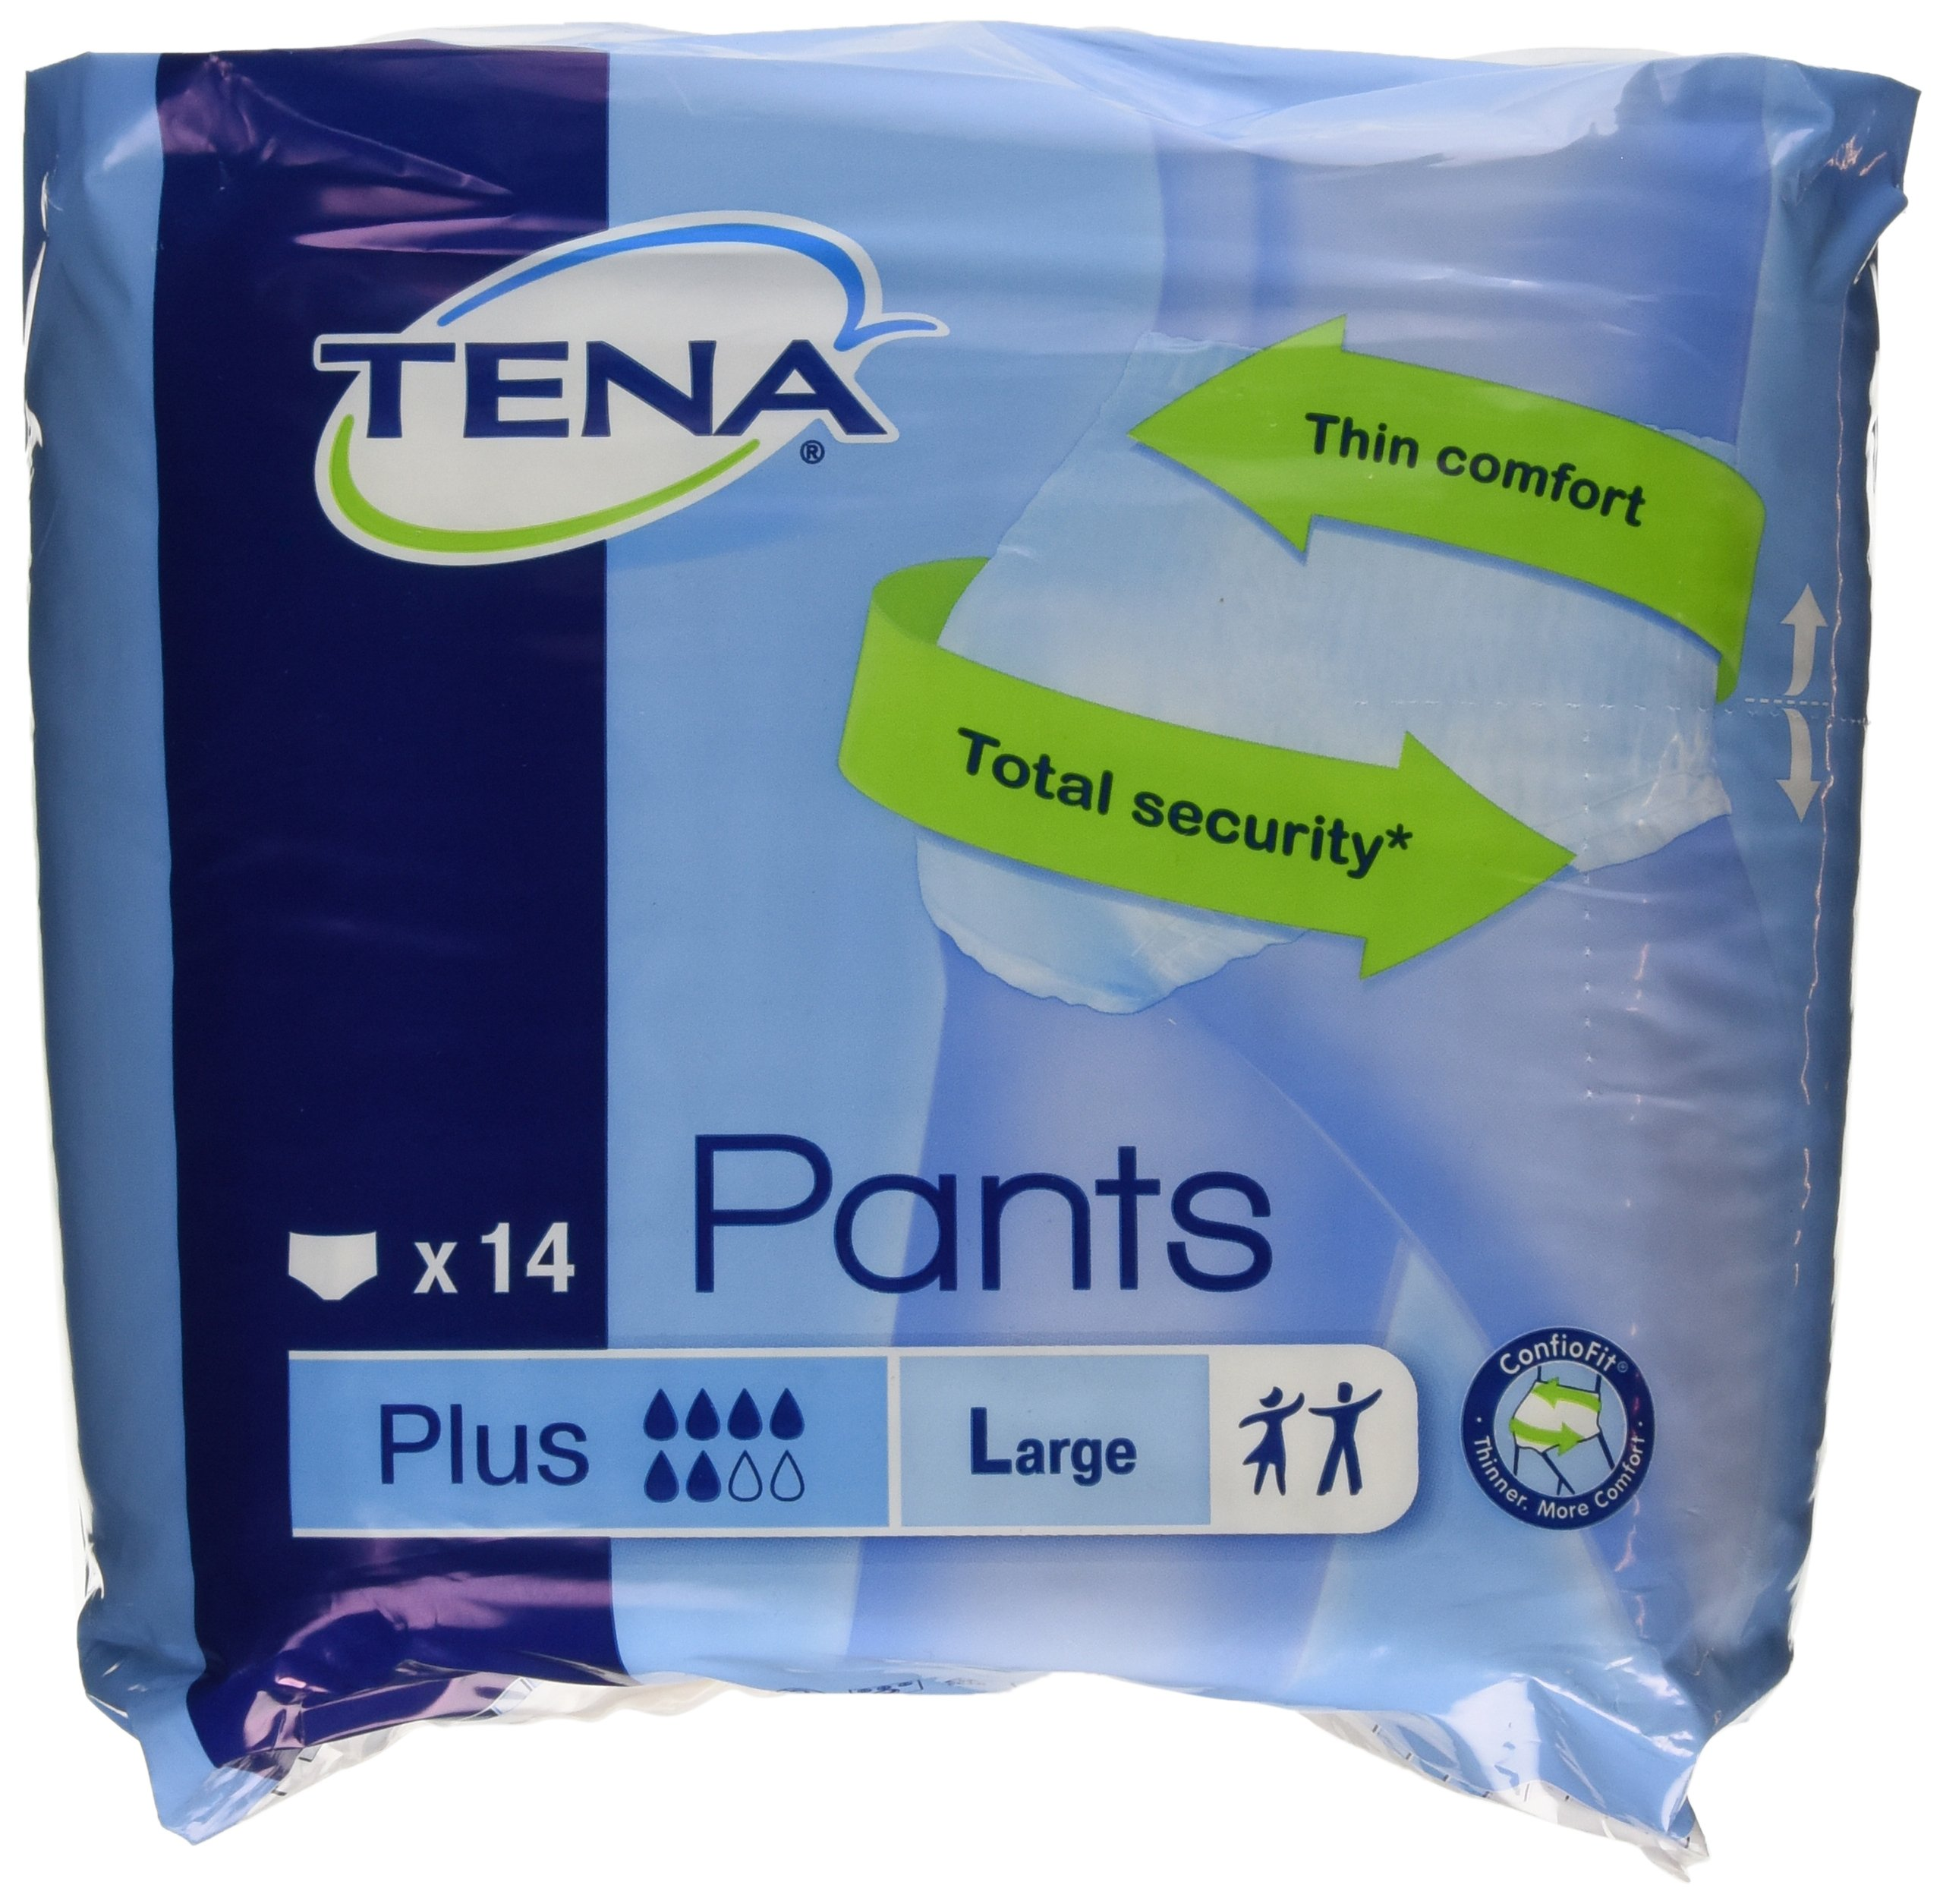 Tena - Pants - Pañales, Talla L - 14 unidades